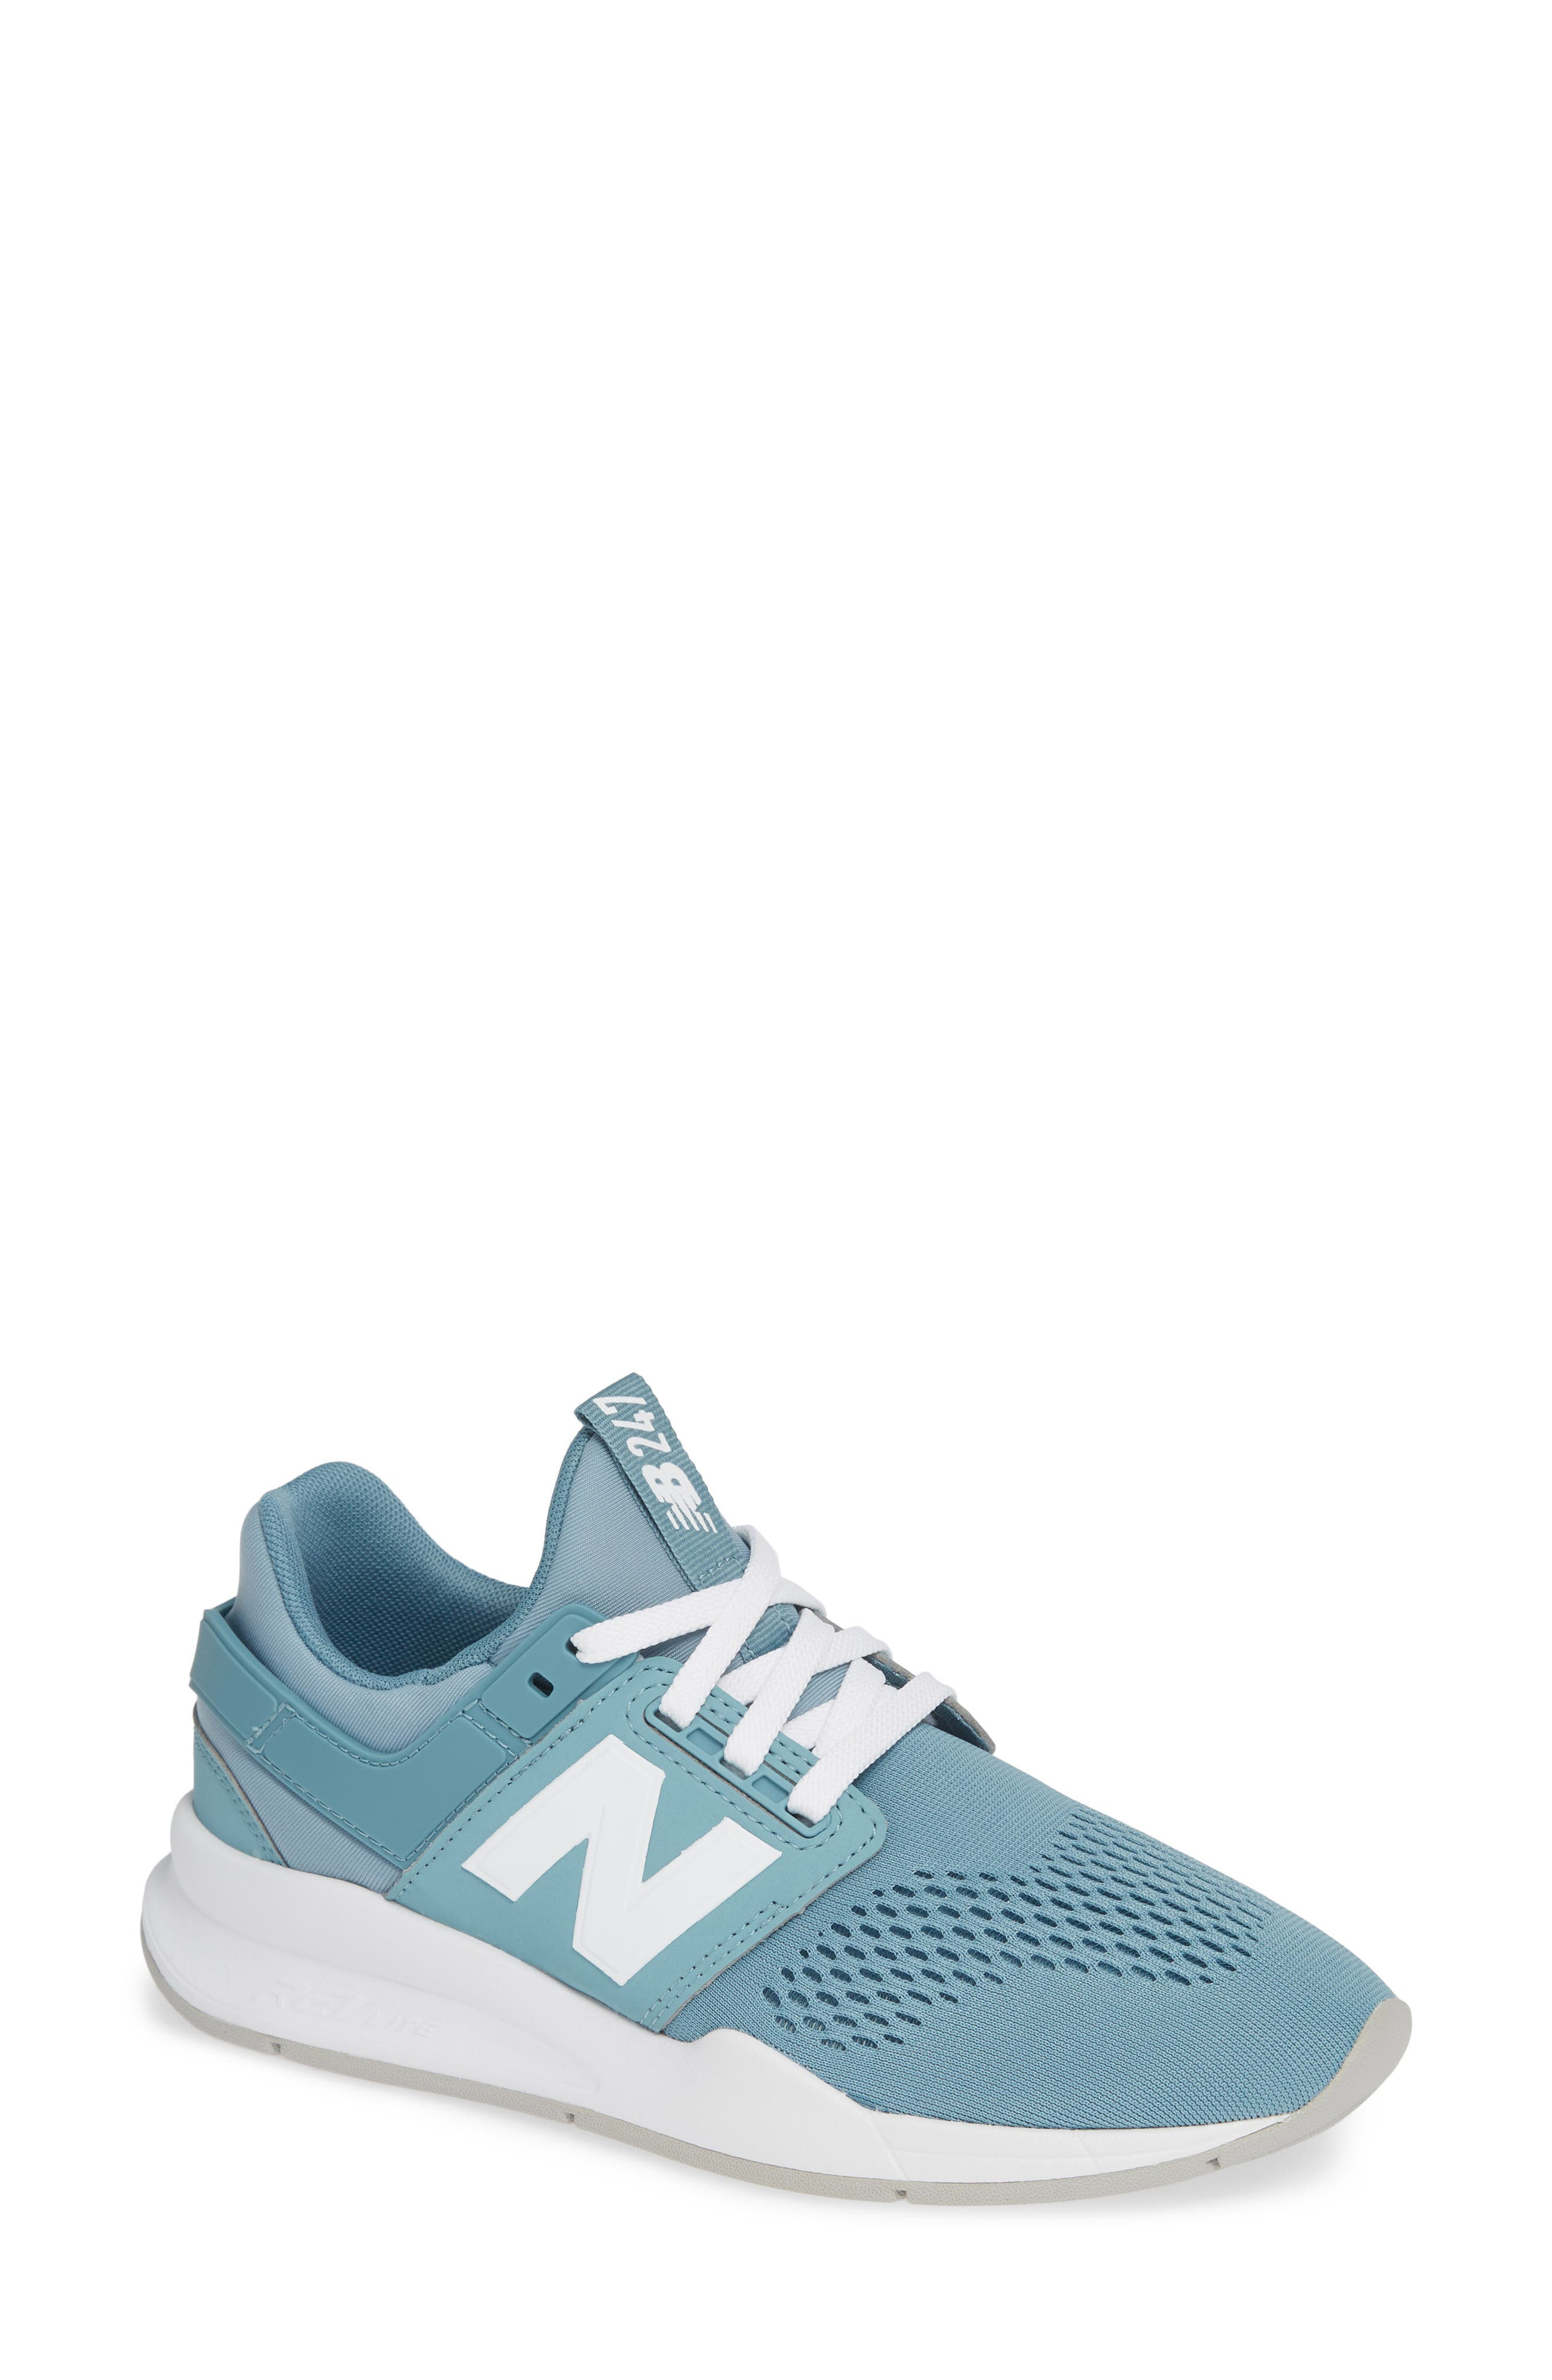 247 Sneaker,                         Main,                         color, SMOKE BLUE